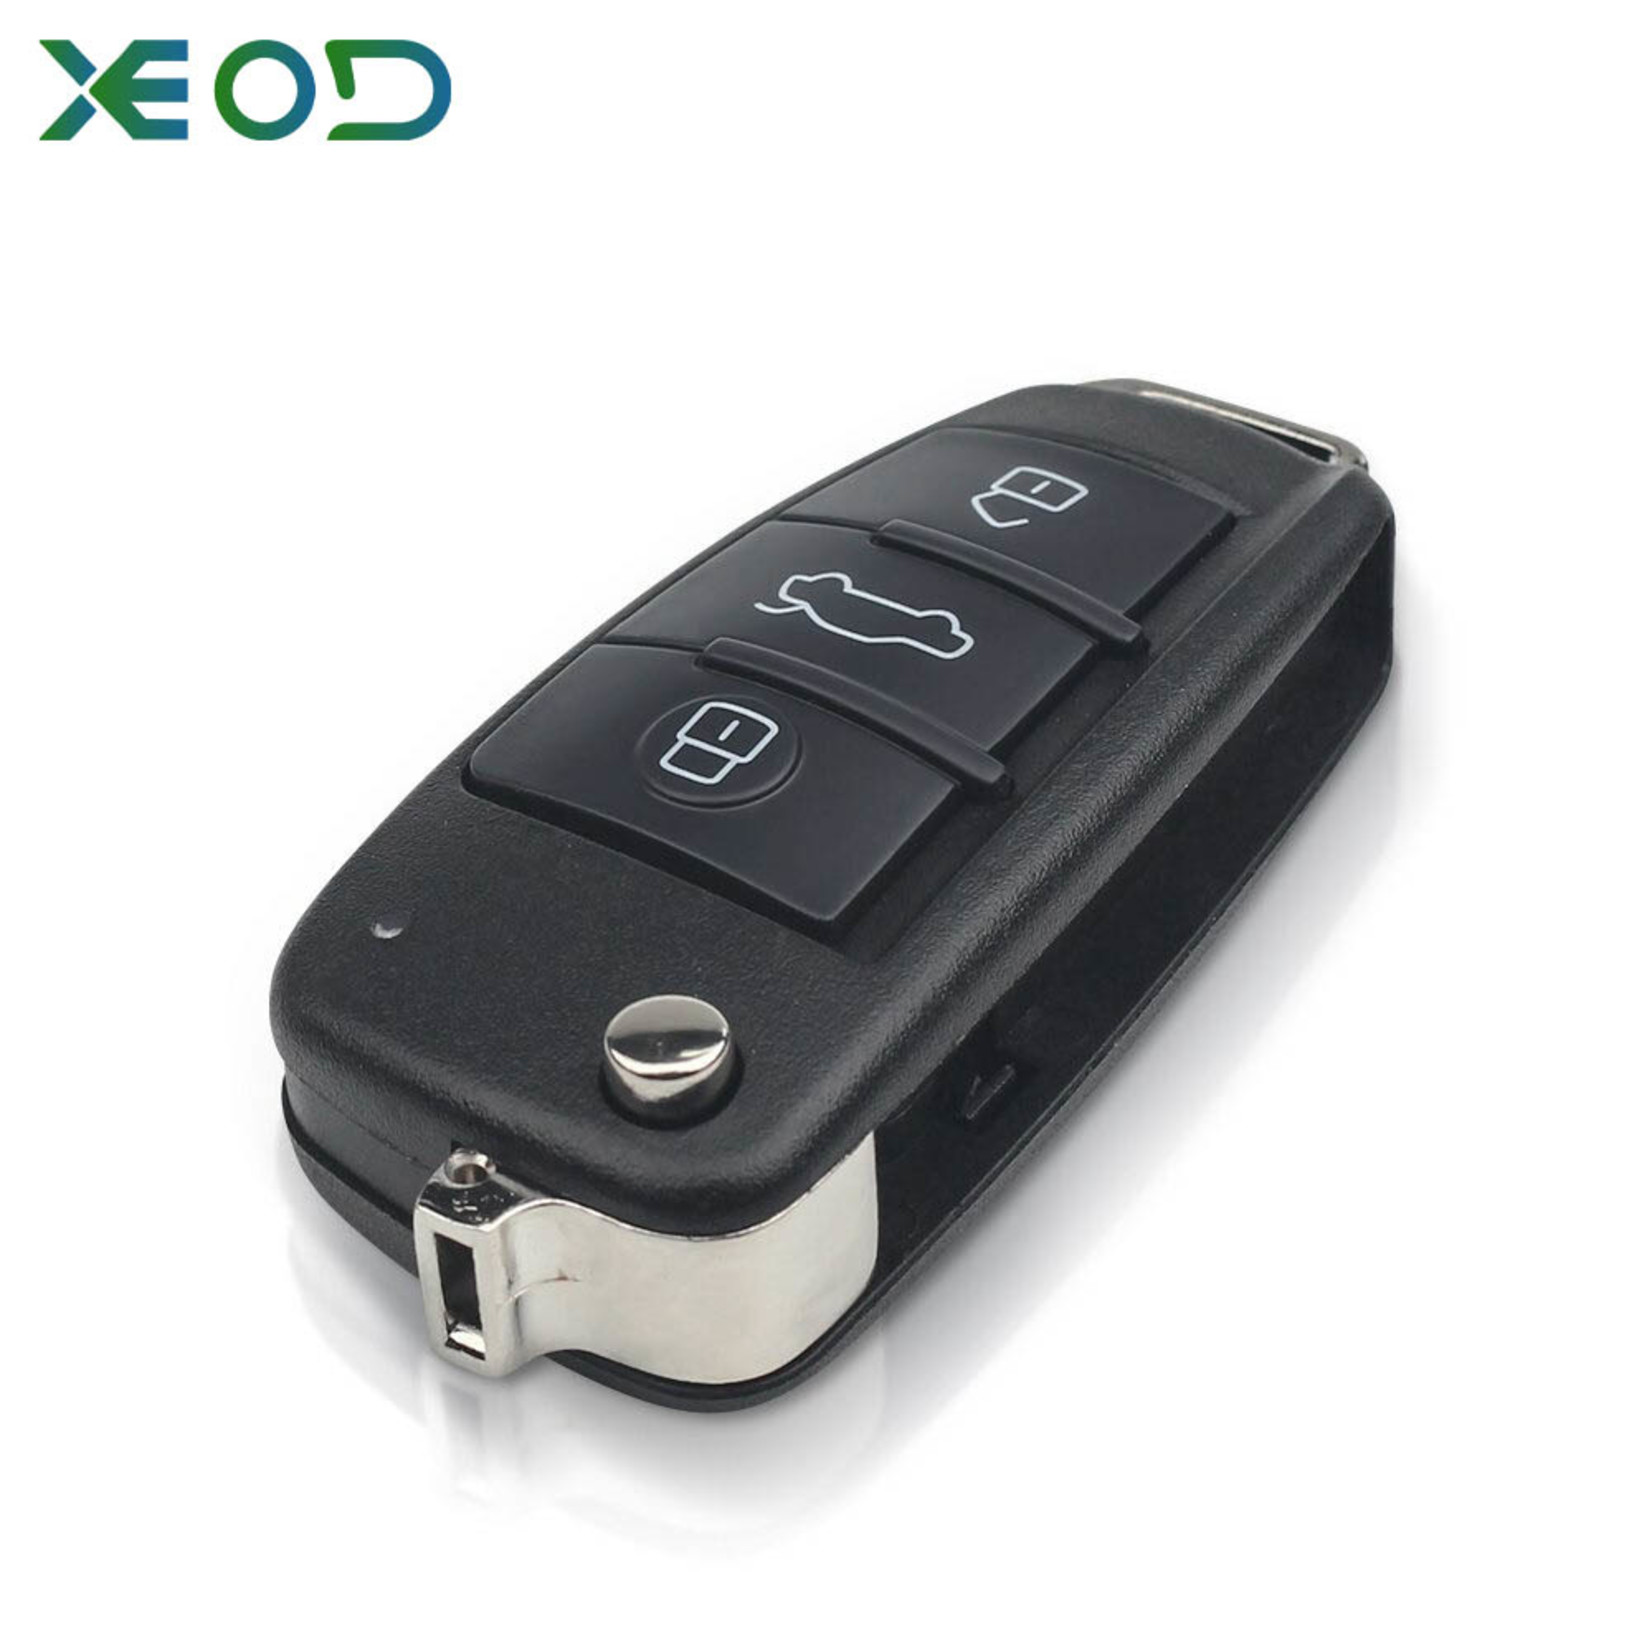 XEOD Audi klap sleutelbehuizing 3-knops